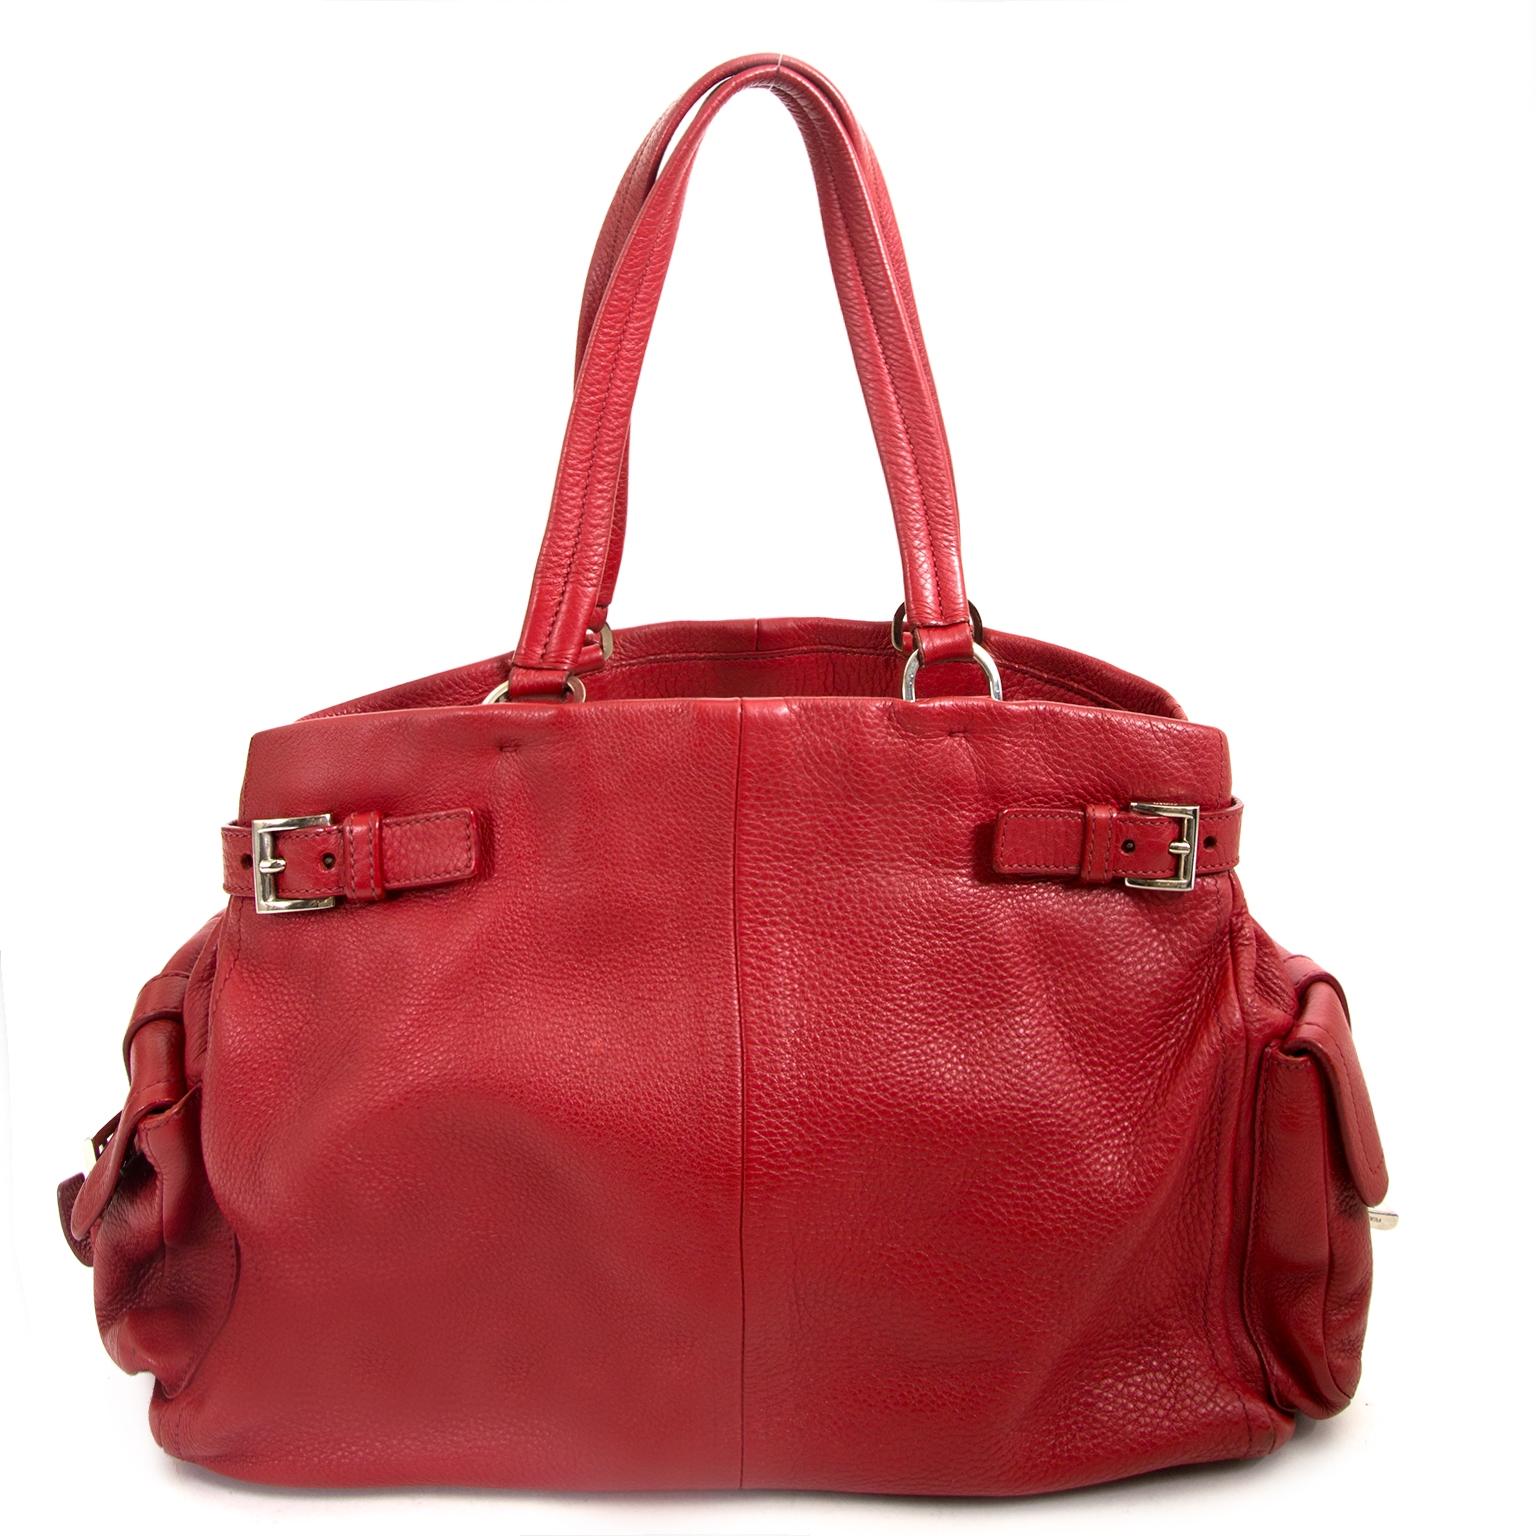 prada rode lederen tas nu te koop bij labellov vintage mode webshop belgië